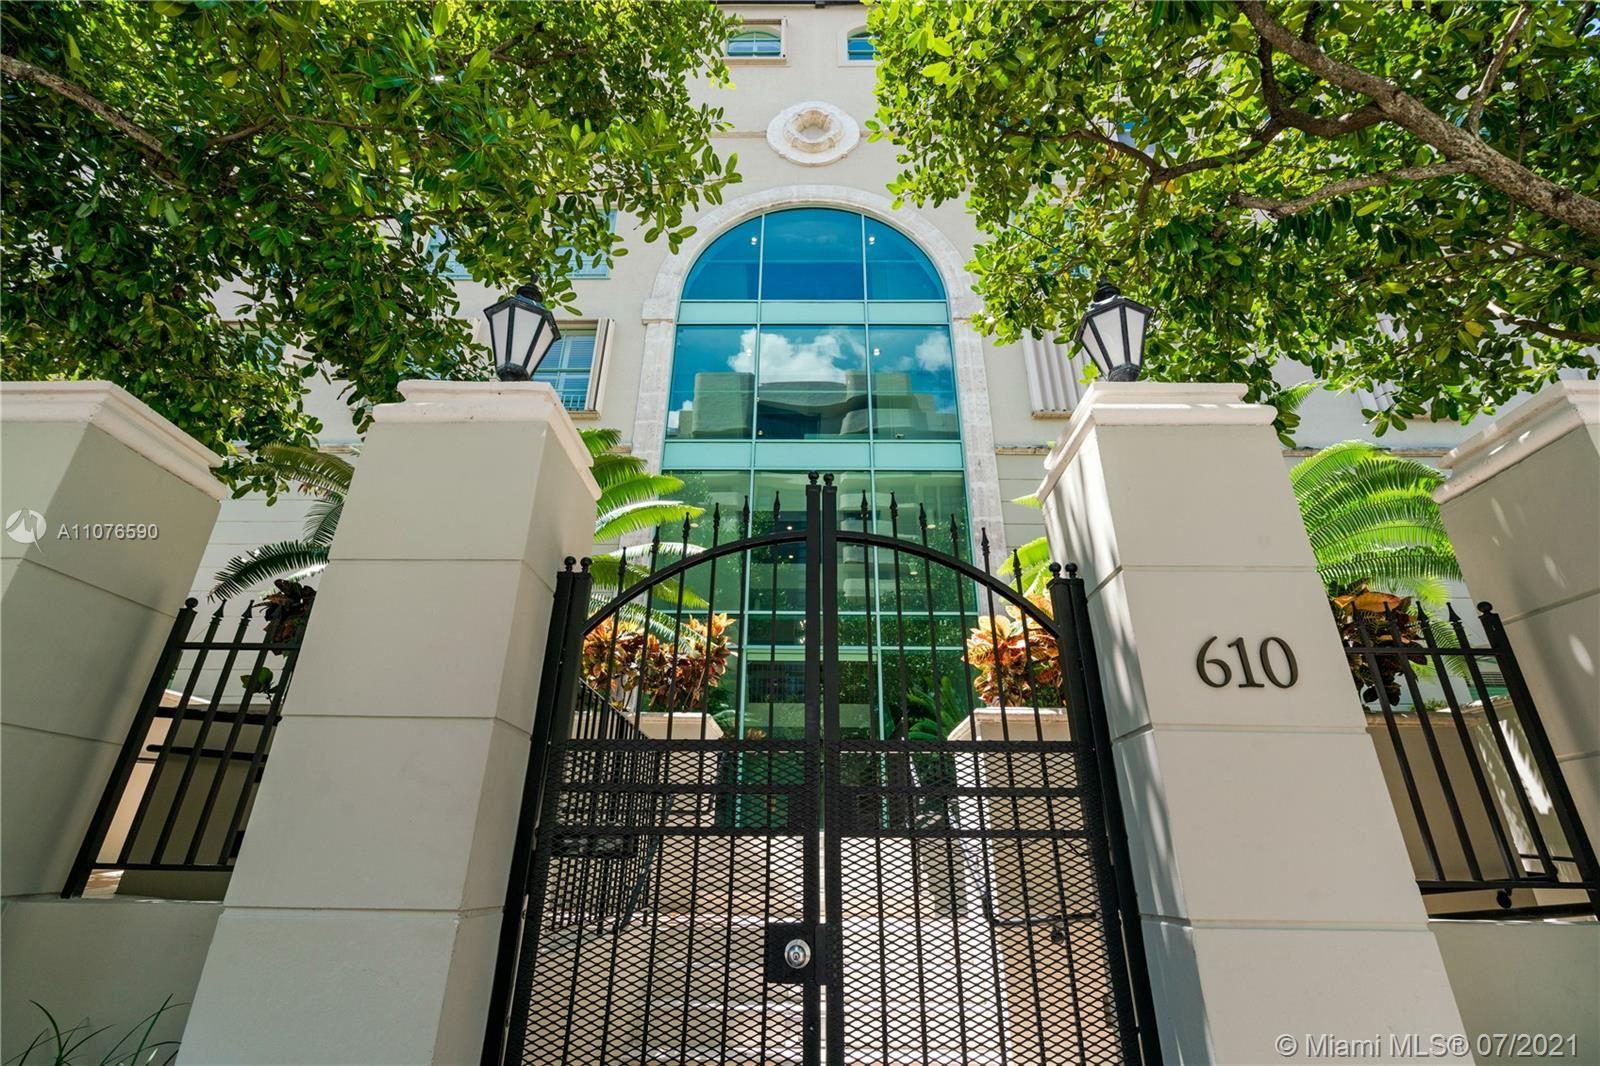 610 Valencia Ave #302, Coral Gables, FL 33134 - #: A11076590